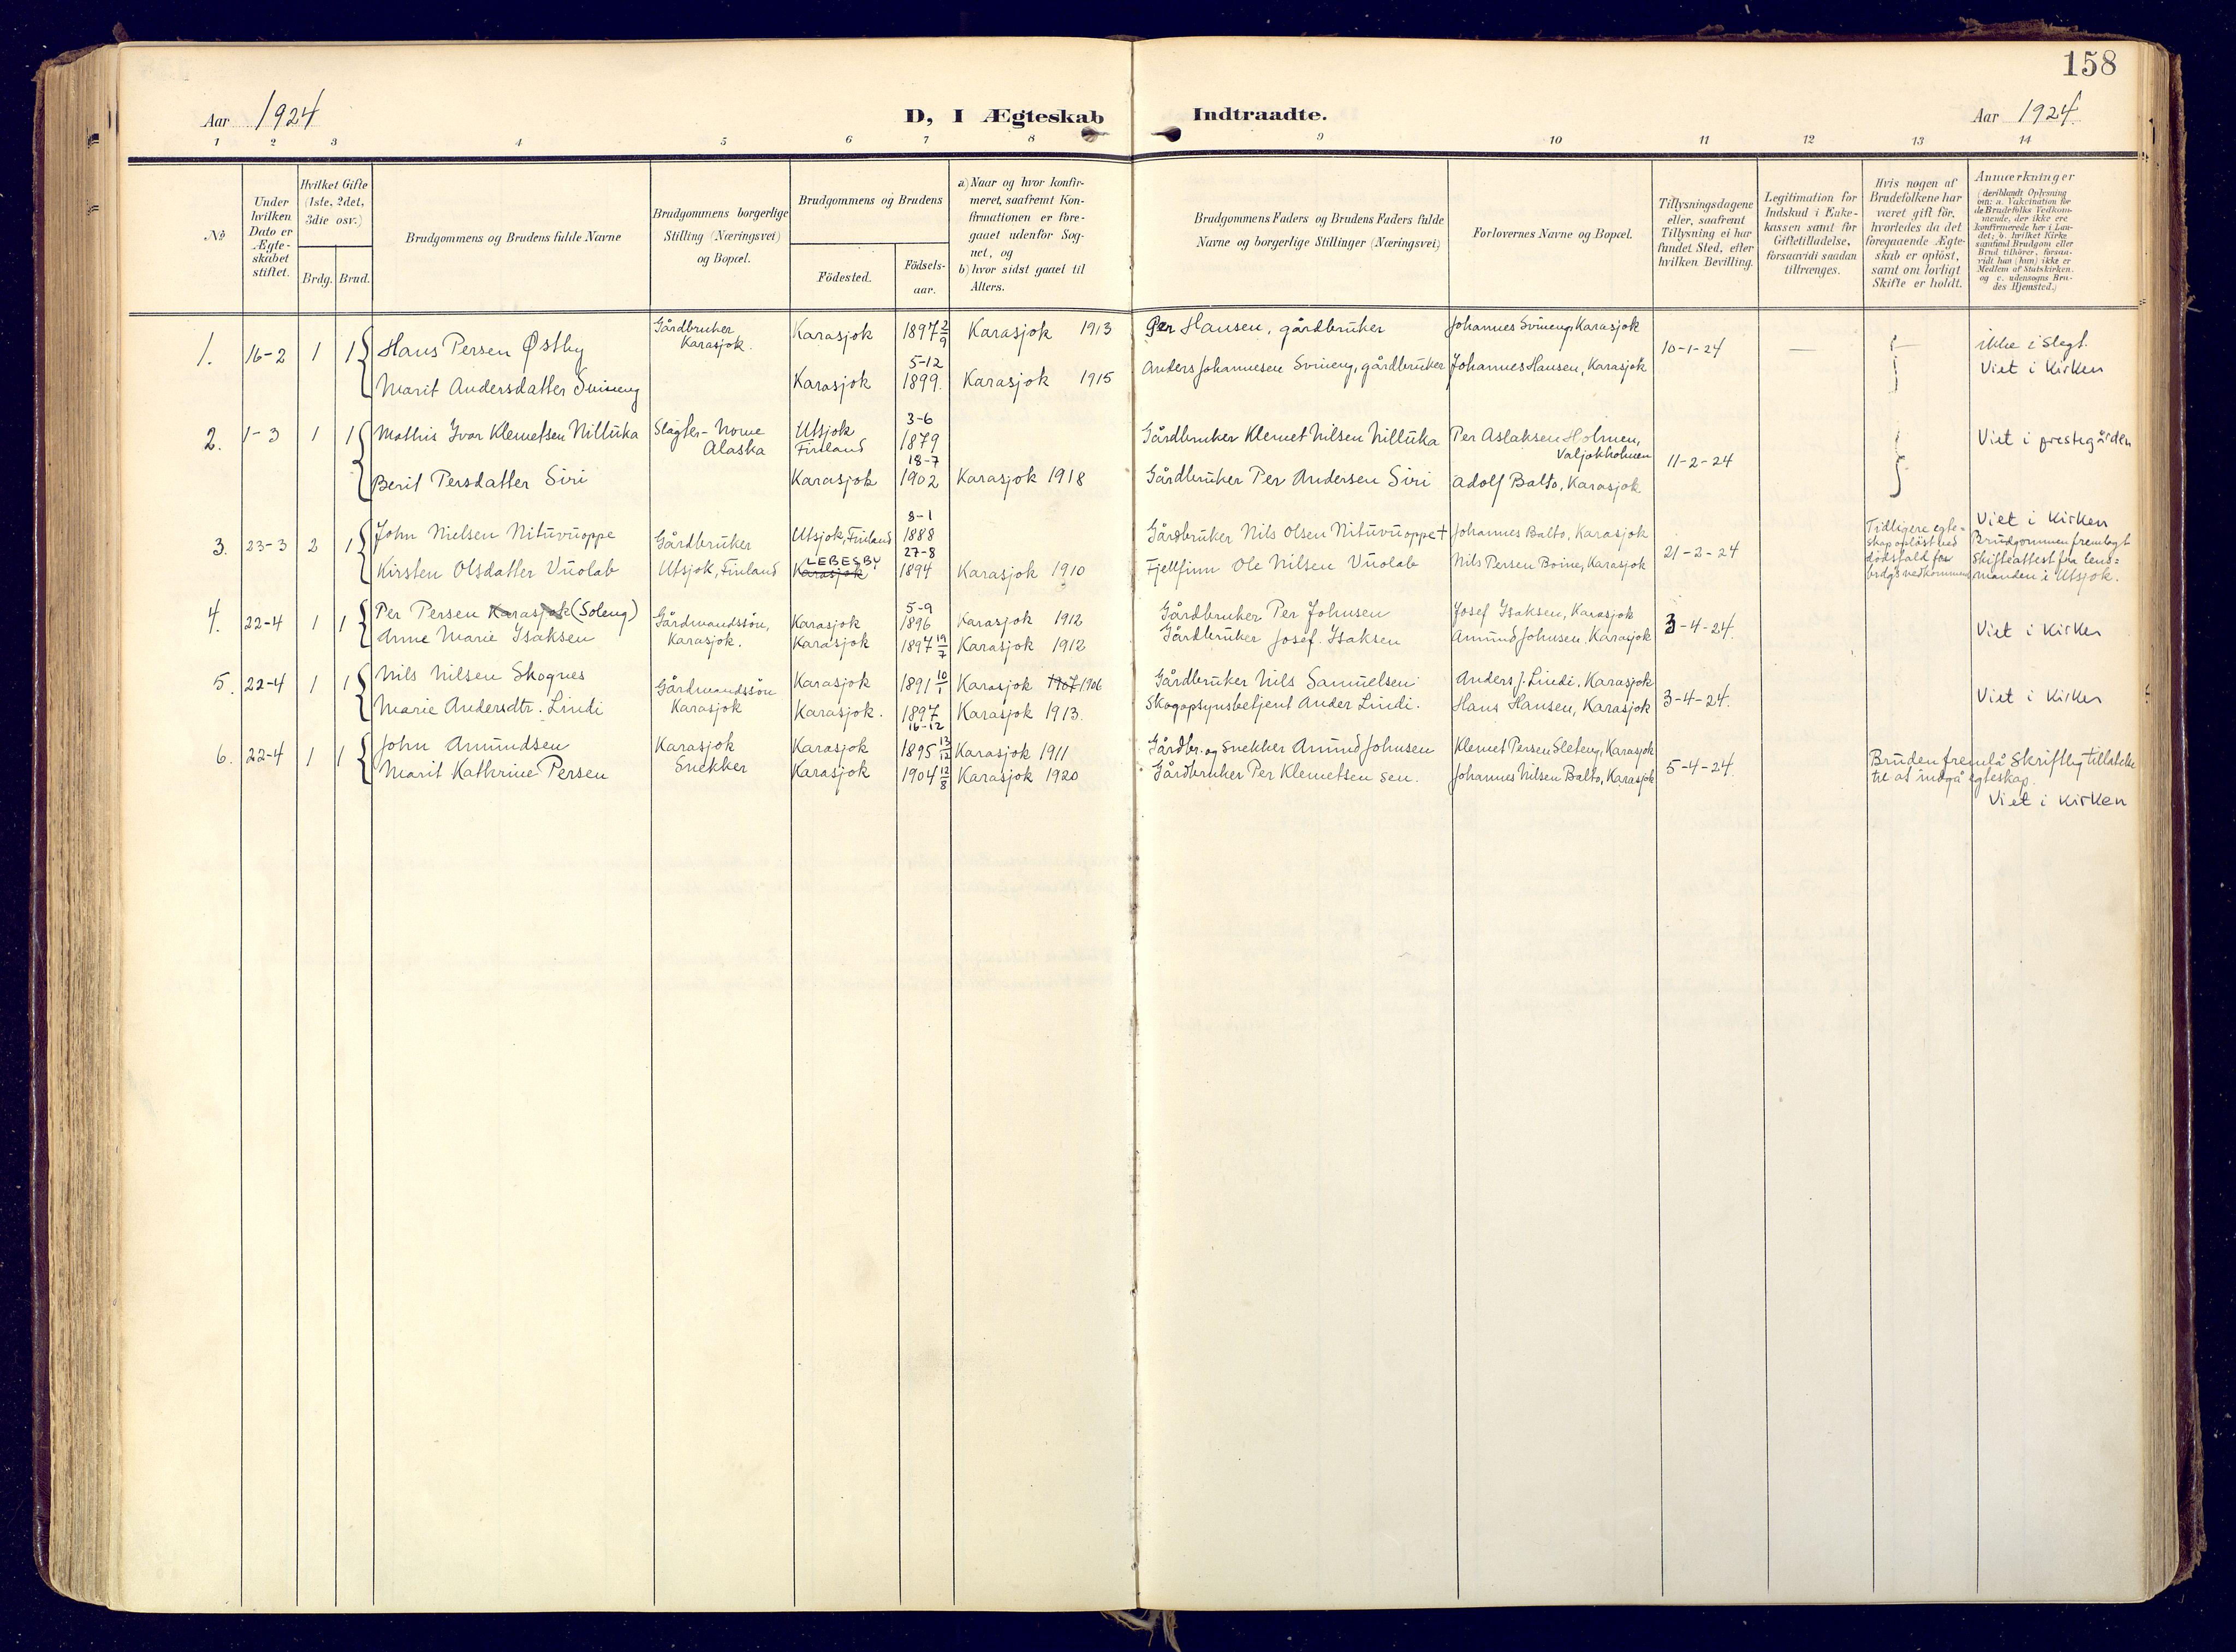 SATØ, Karasjok sokneprestkontor, H/Ha: Ministerialbok nr. 3, 1907-1926, s. 158